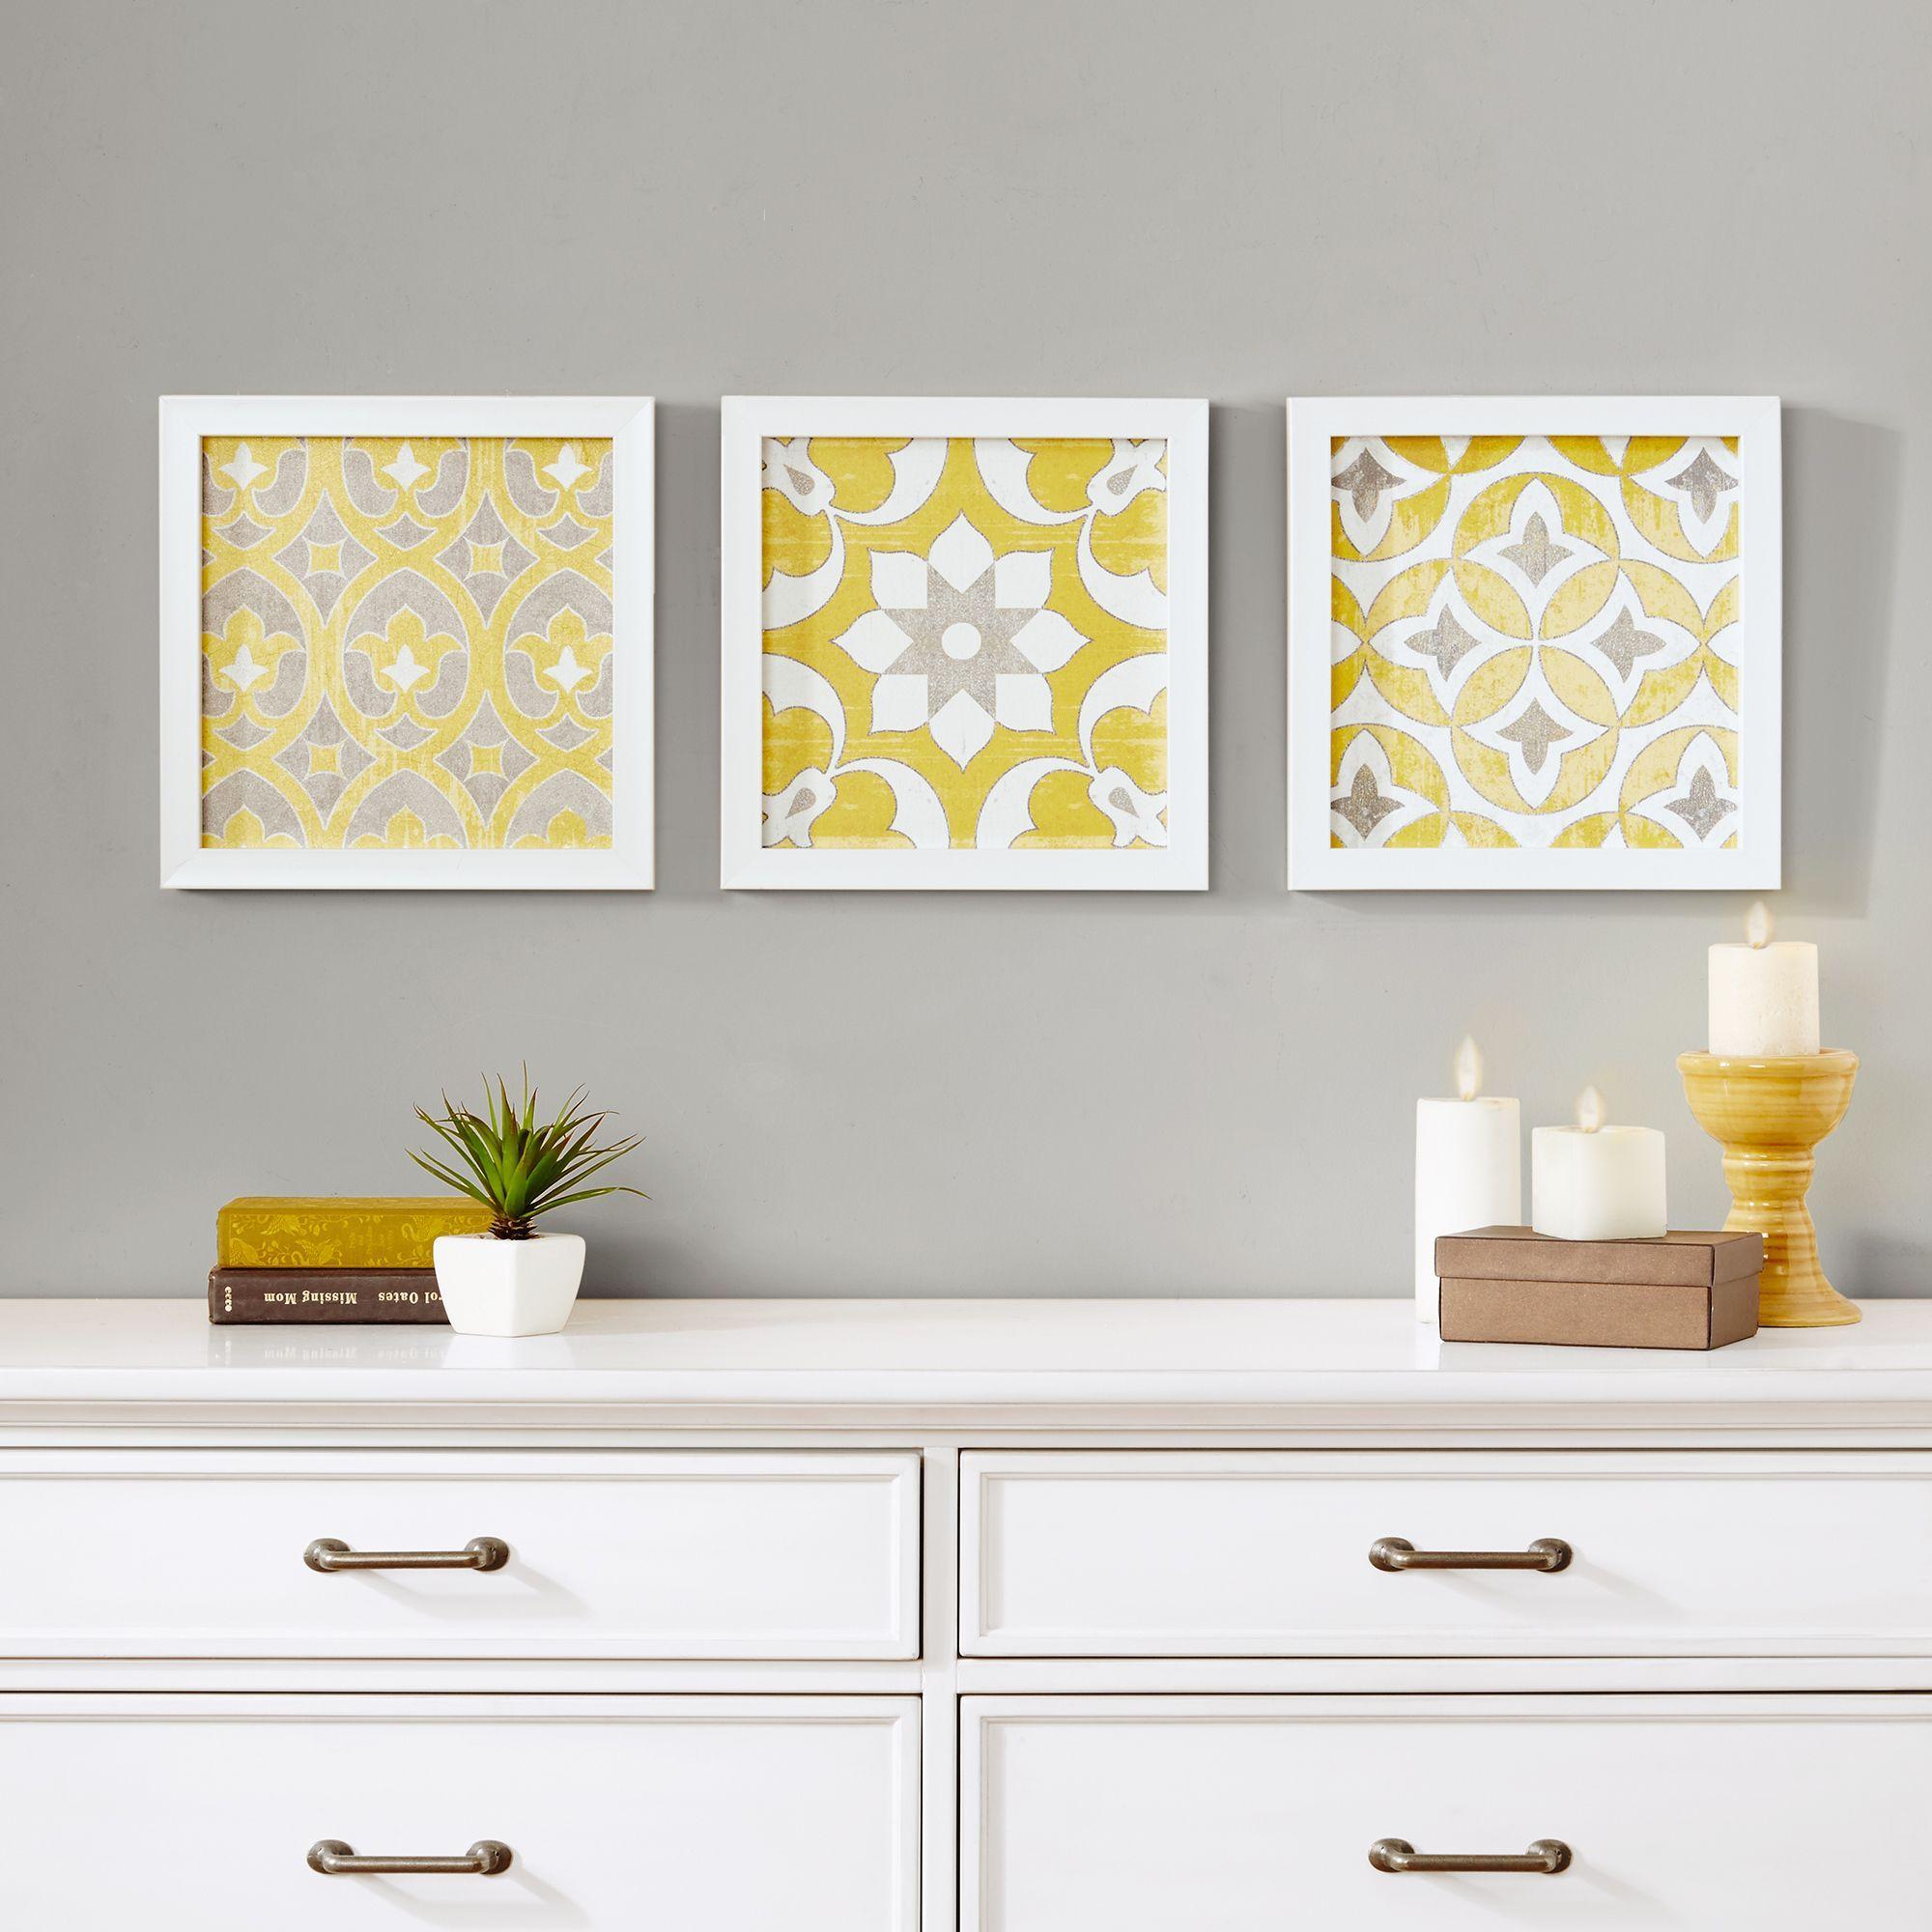 Madison park tuscan tiles yellow framed gel coated paper set of 3 madison park tuscan tiles yellow framed gel coated paper set of 3 by madison park jeuxipadfo Gallery